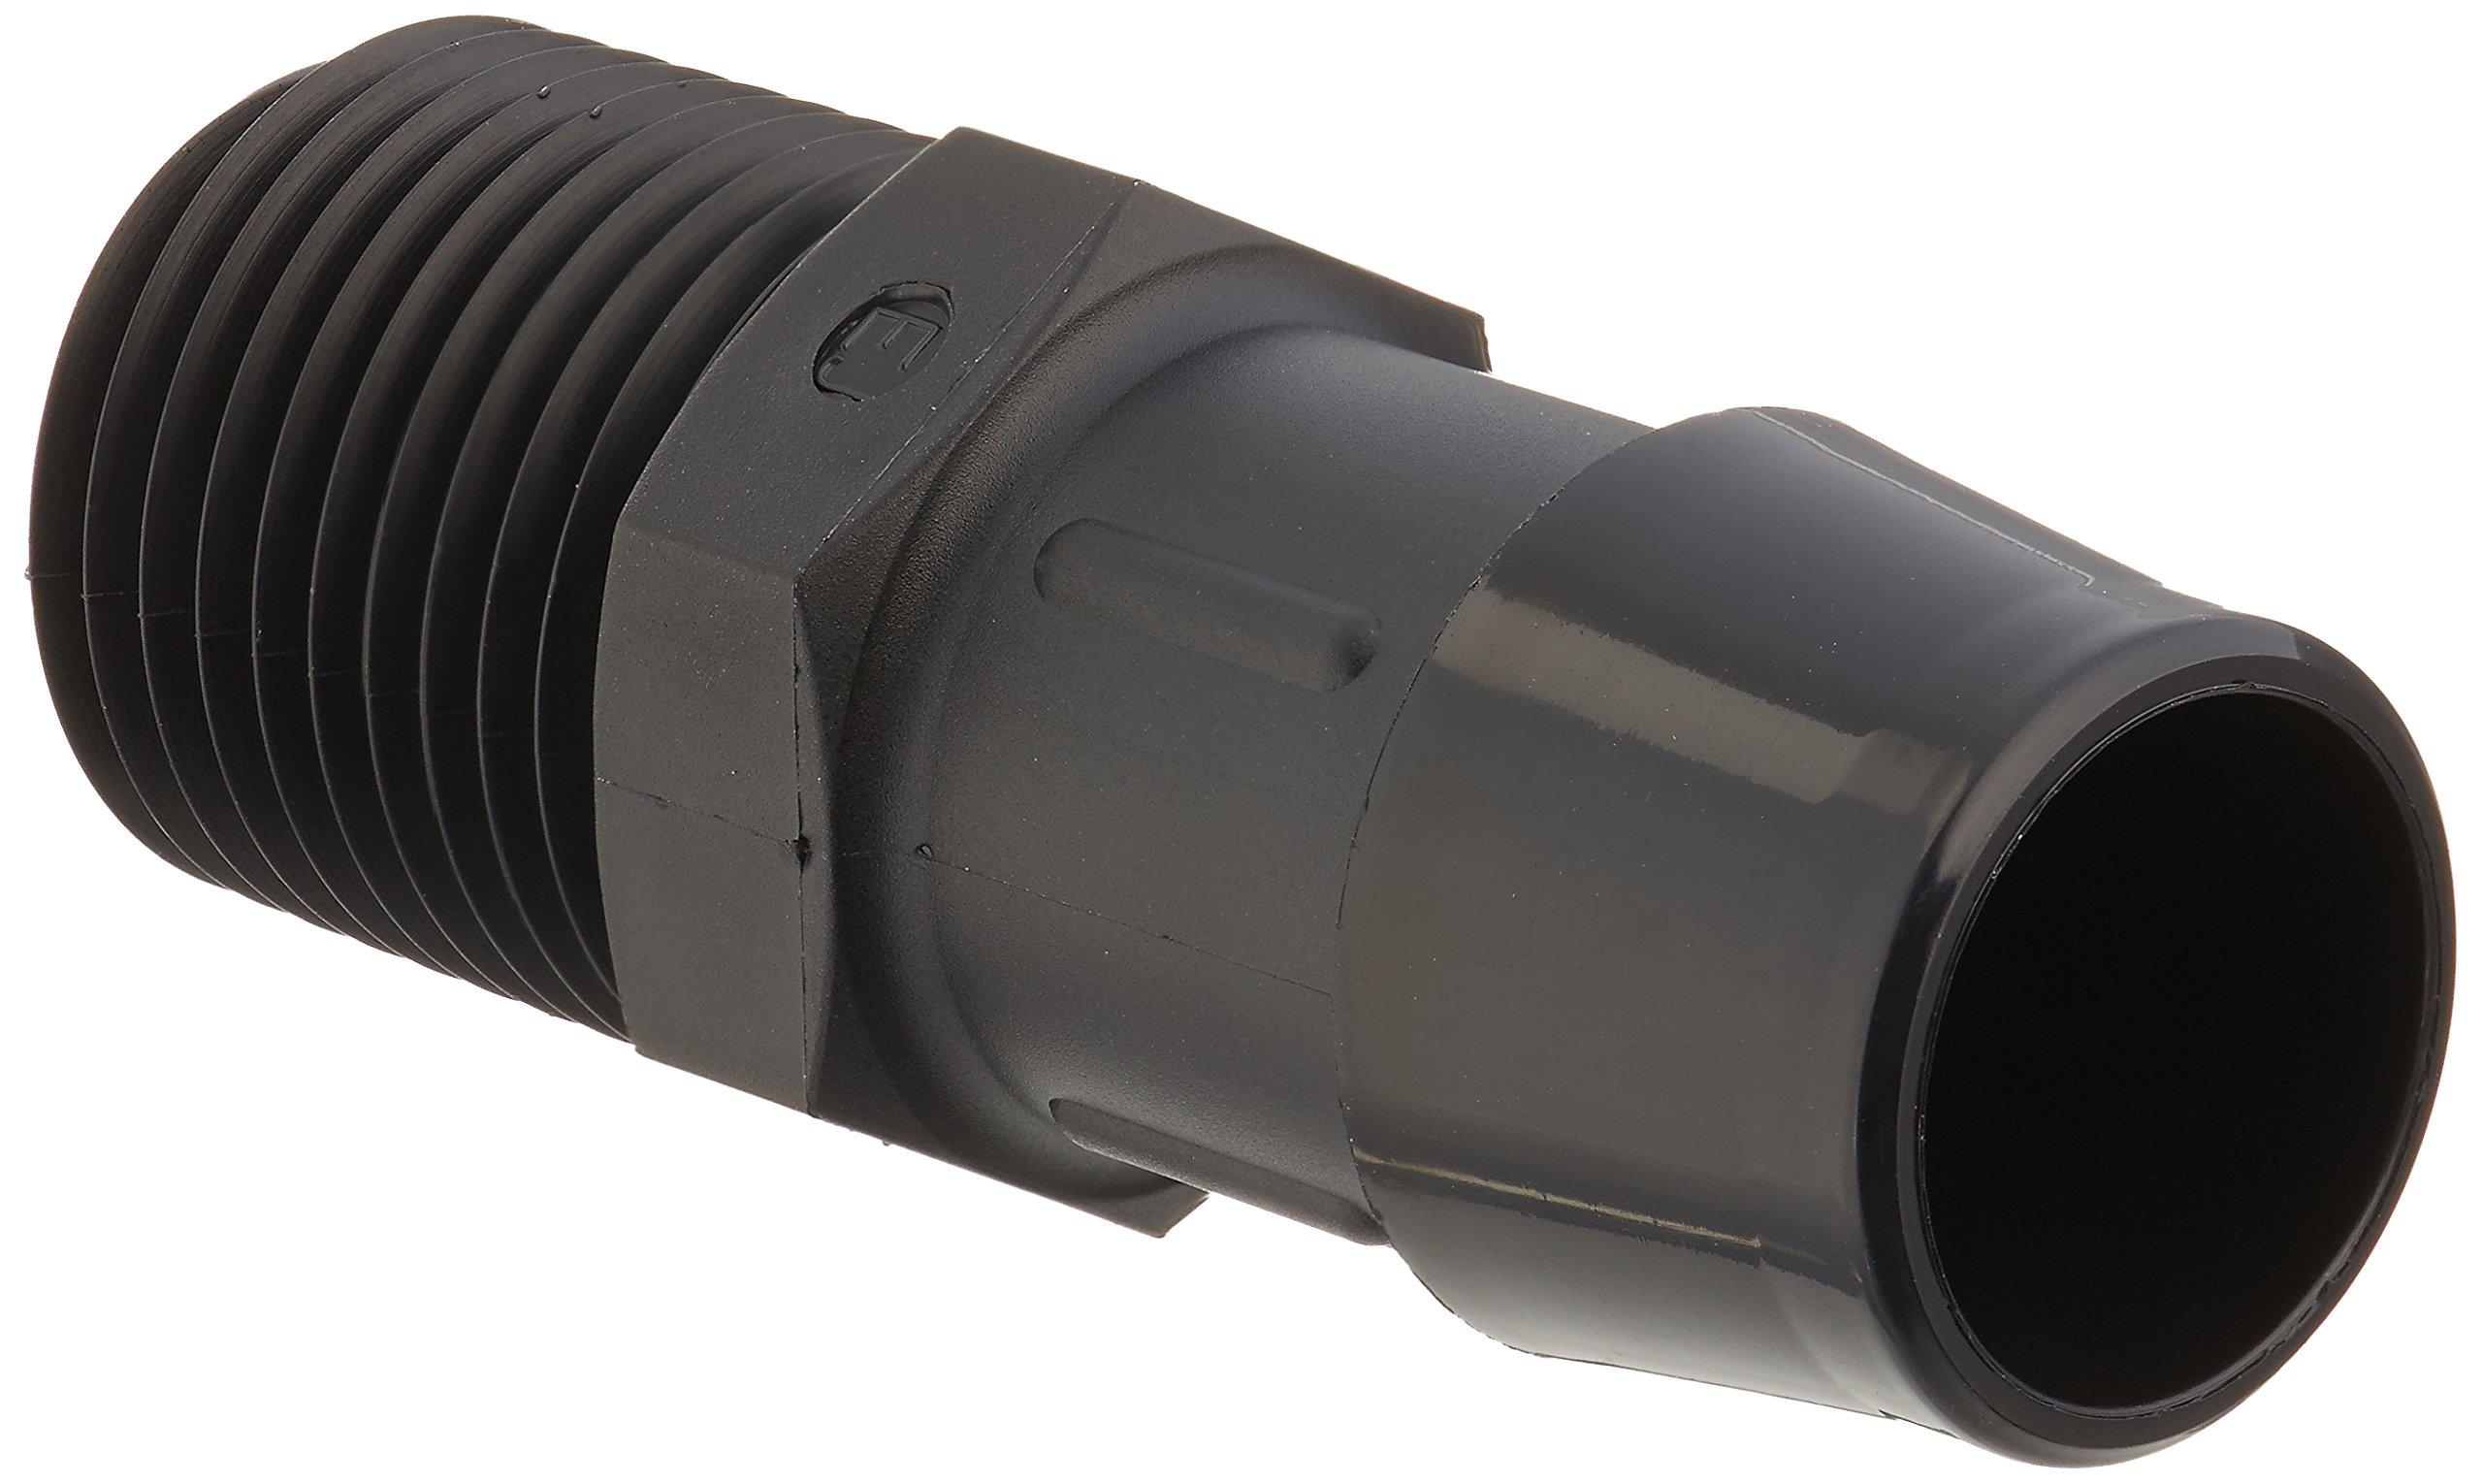 Eldon James A8-12BN Black Nylon Adapter Fitting, 1/2-14 NPT to 3/4'' Hose Barb (Pack of 10) by Eldon James